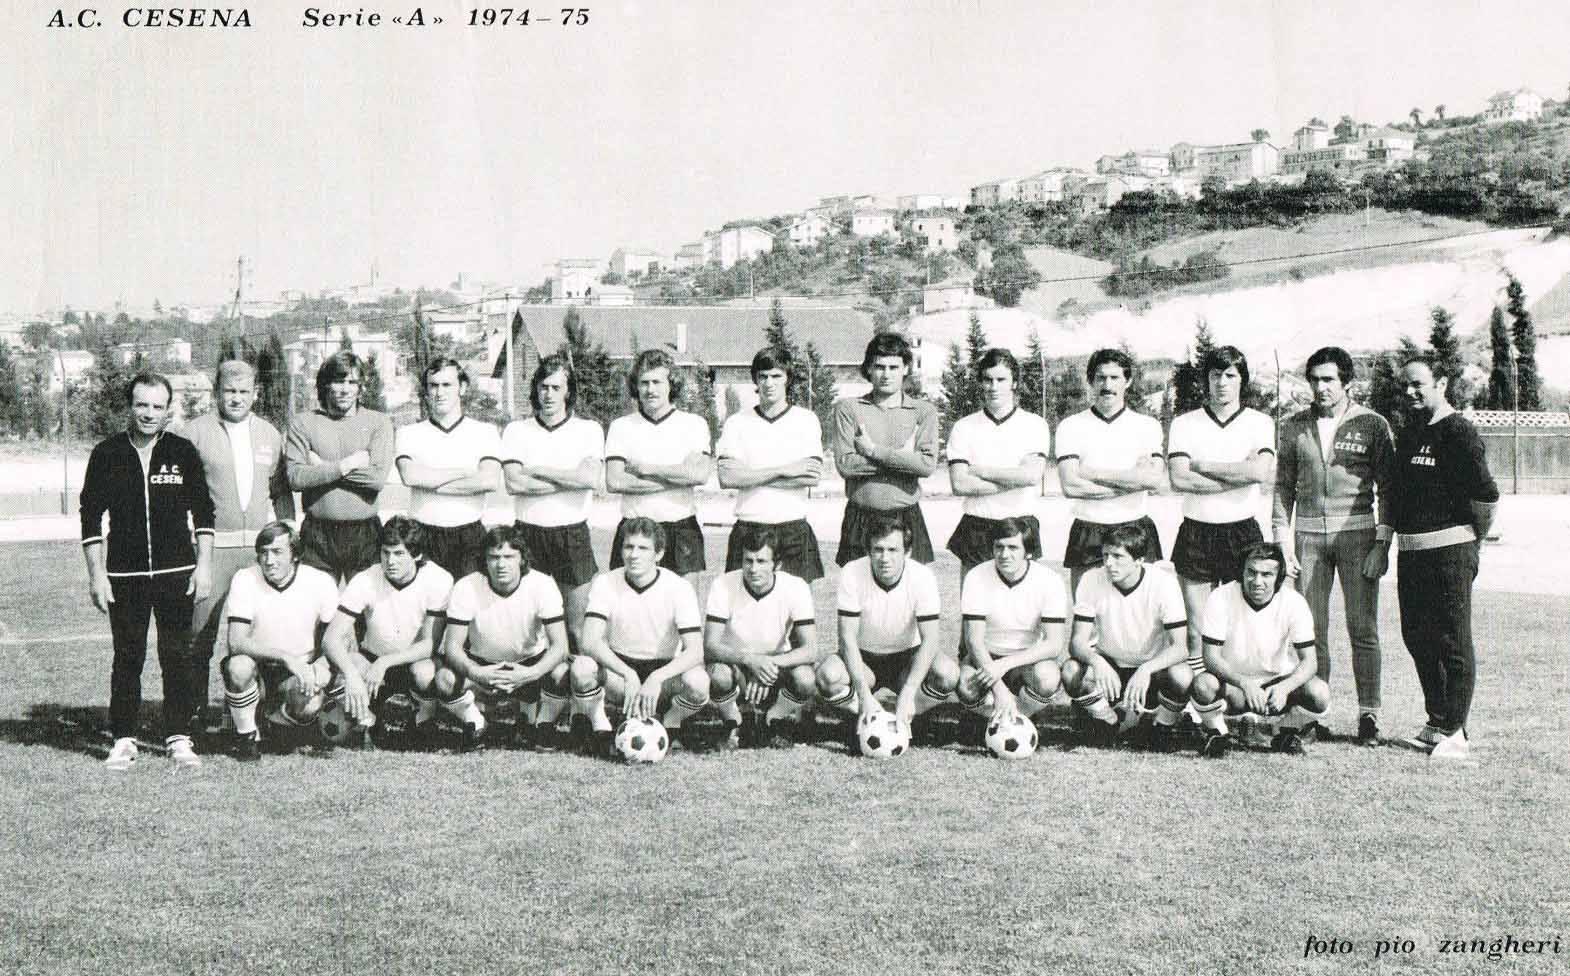 Cesena Calcio Calendario.Associazione Calcio Cesena 1974 1975 Wikipedia